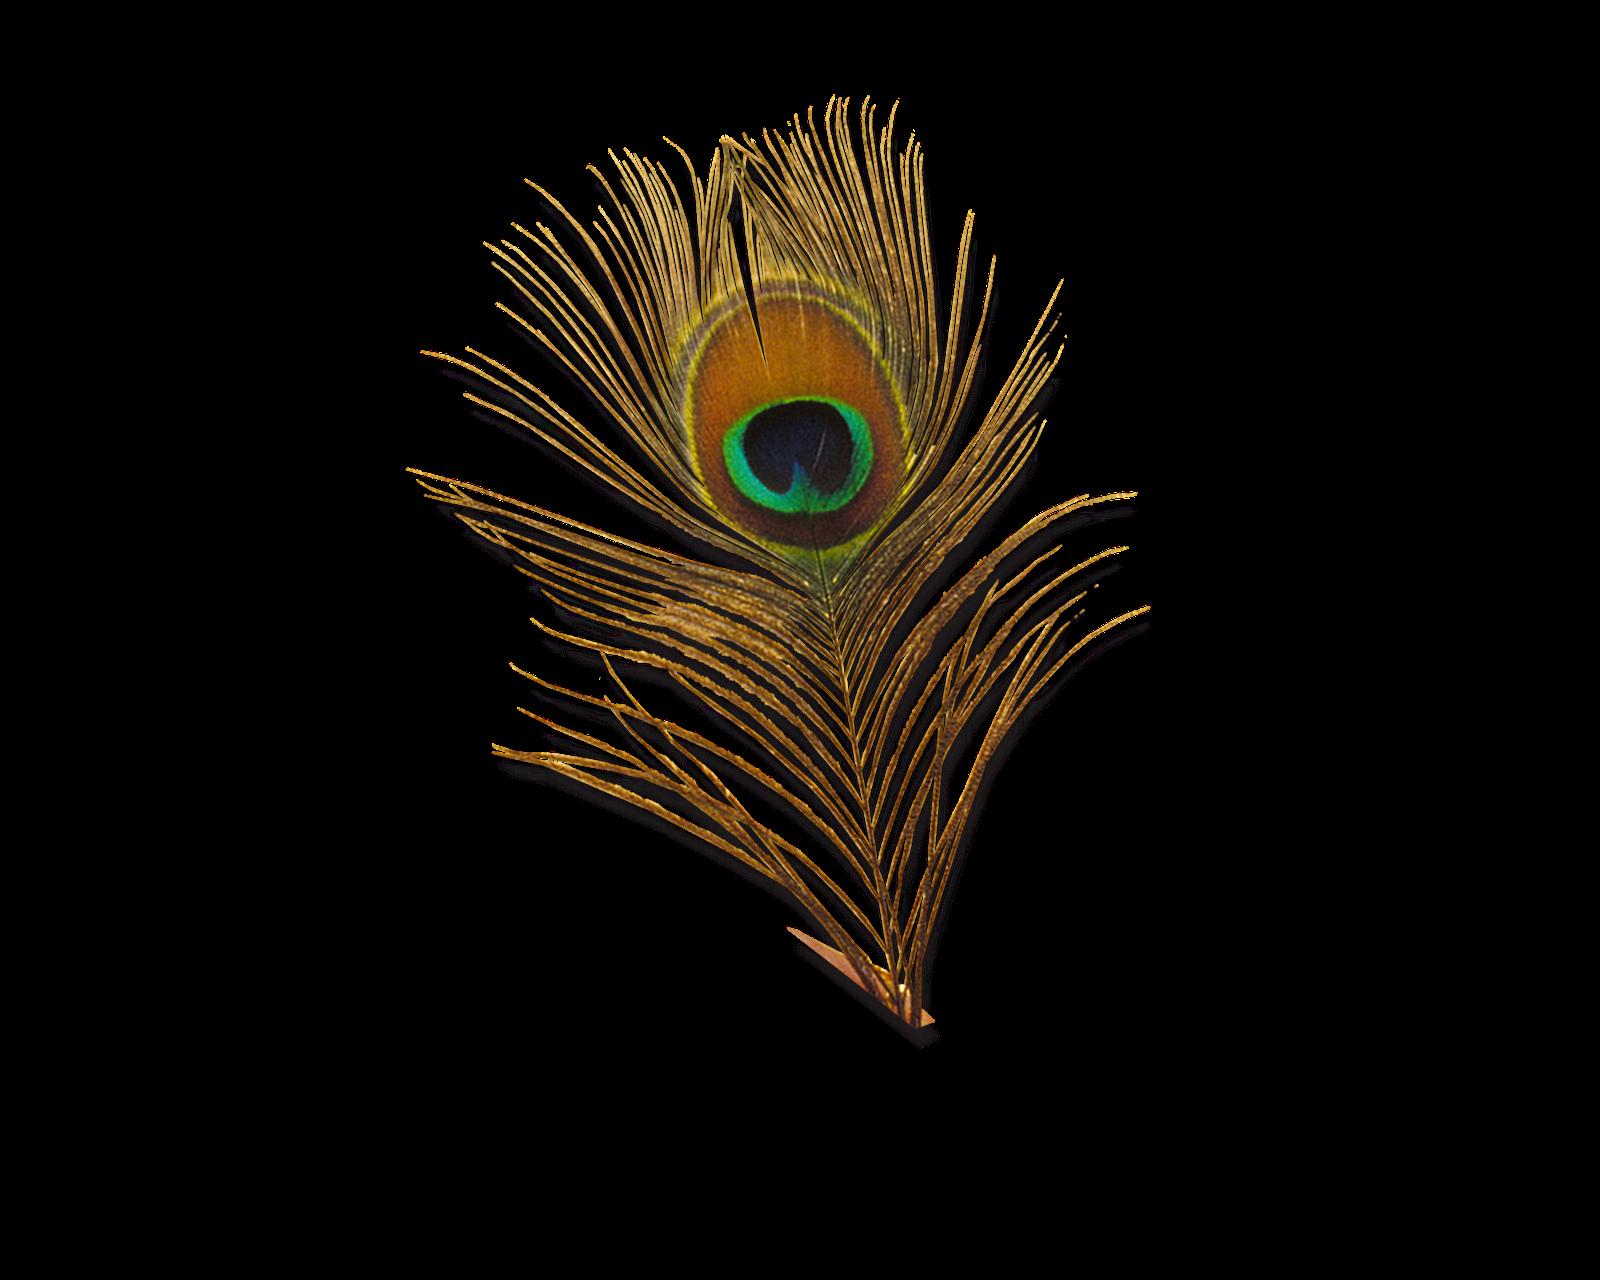 Peacock PNG HD - 122888